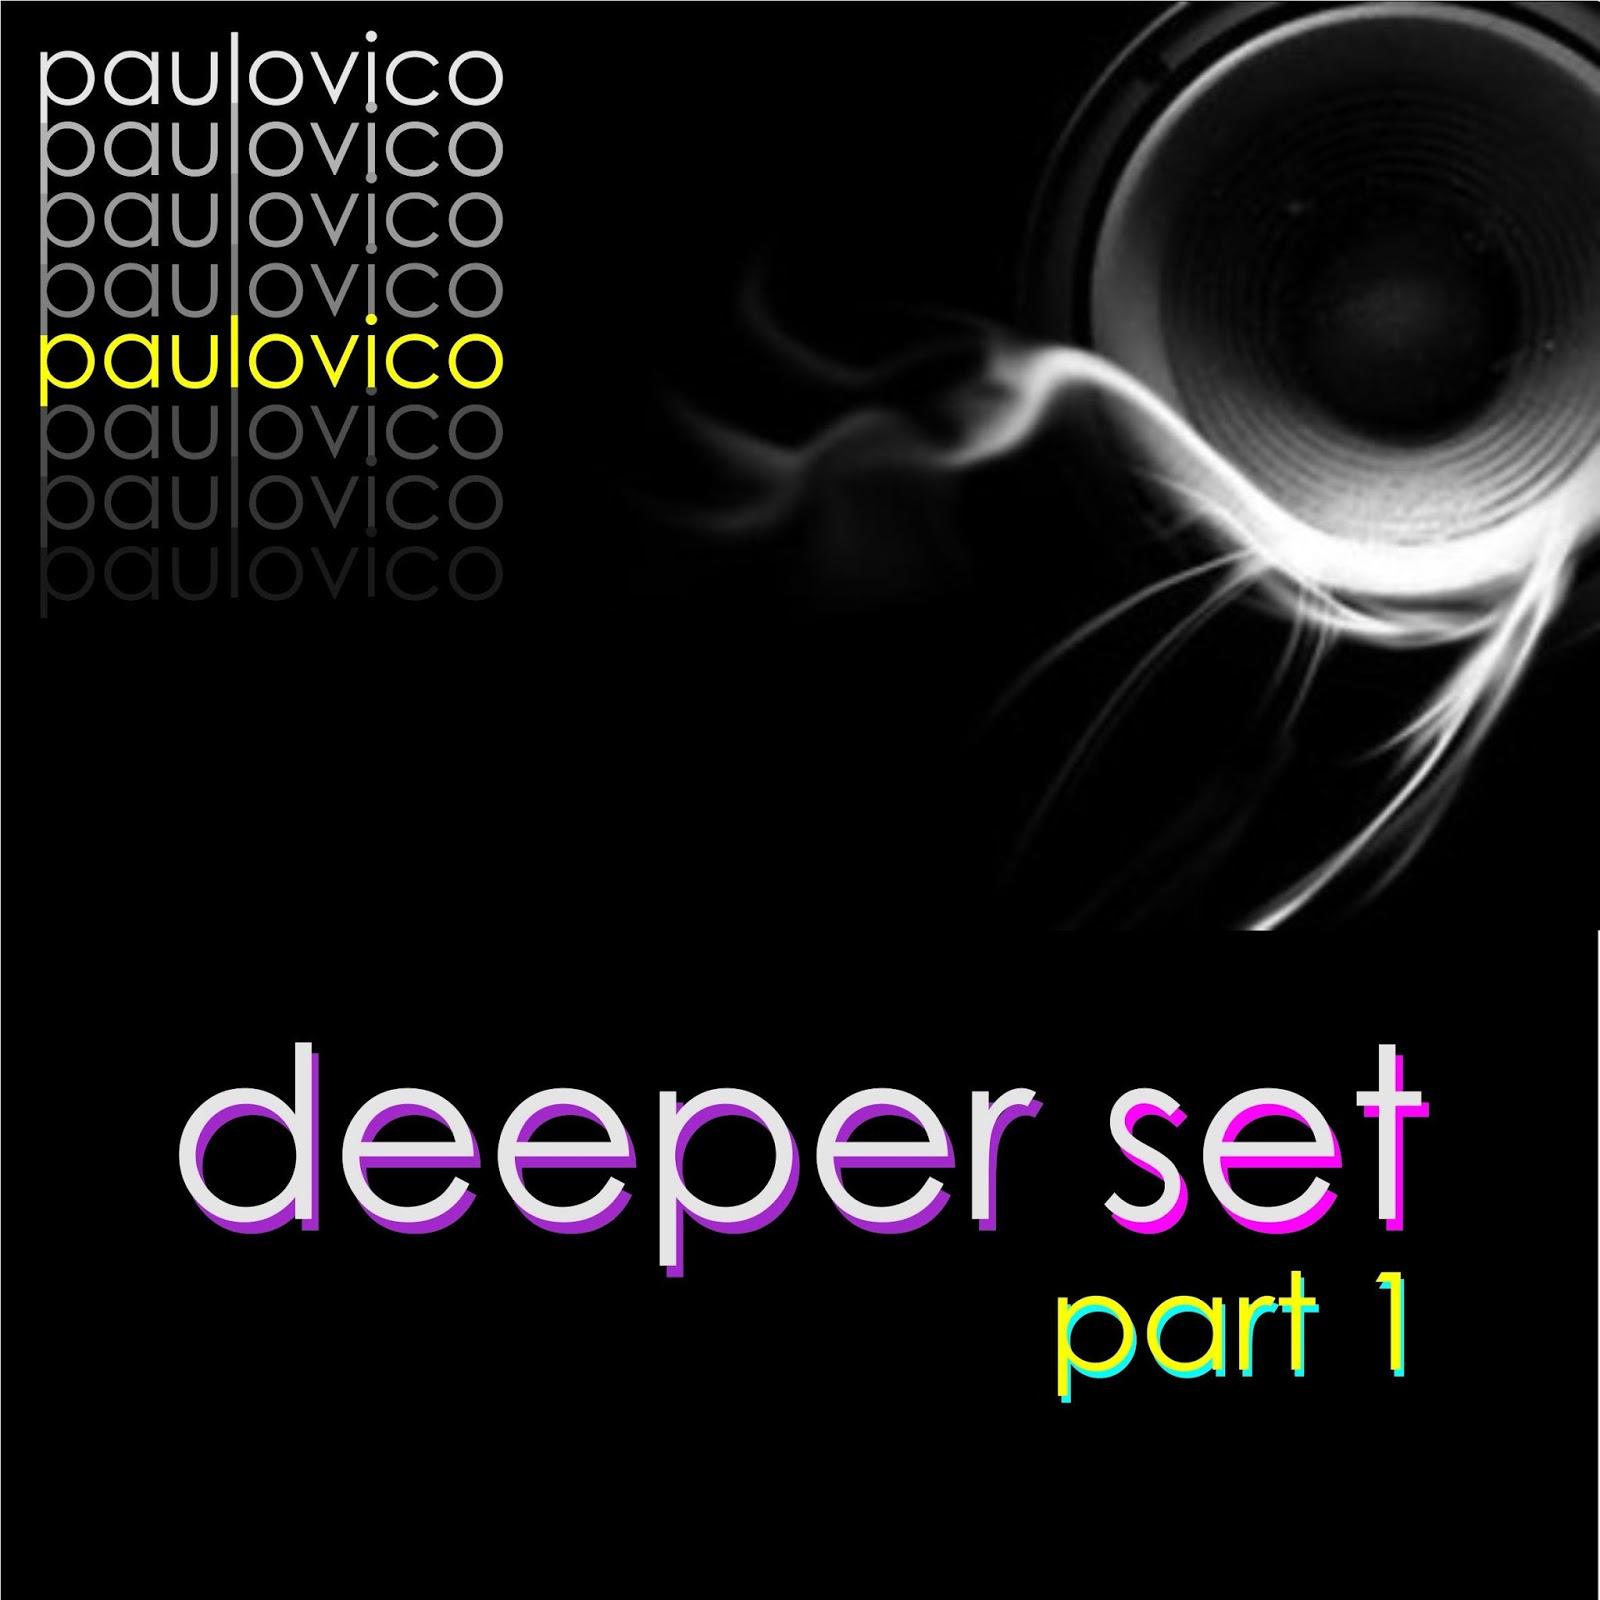 DJ Paulo Vico - Deeper Set Part 1 (PauloVico MixTape)